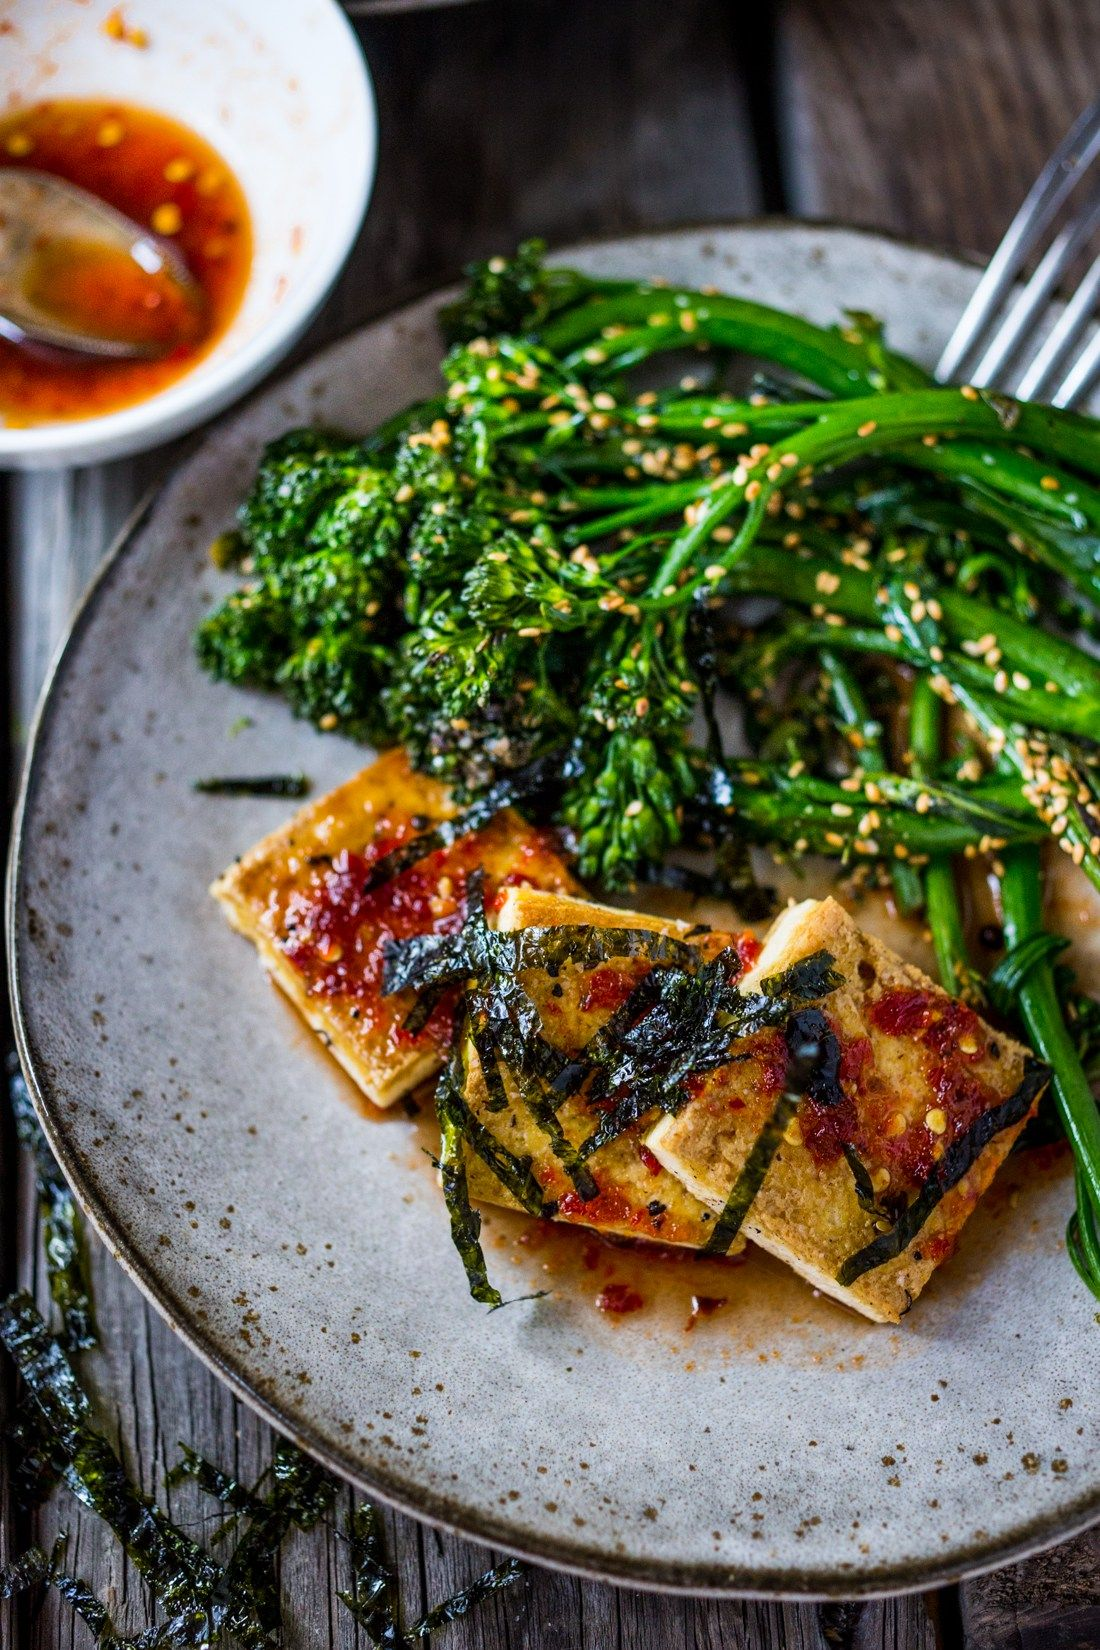 A Tasty recipe for Garlic Chili Tofu with Sesame Broccolini